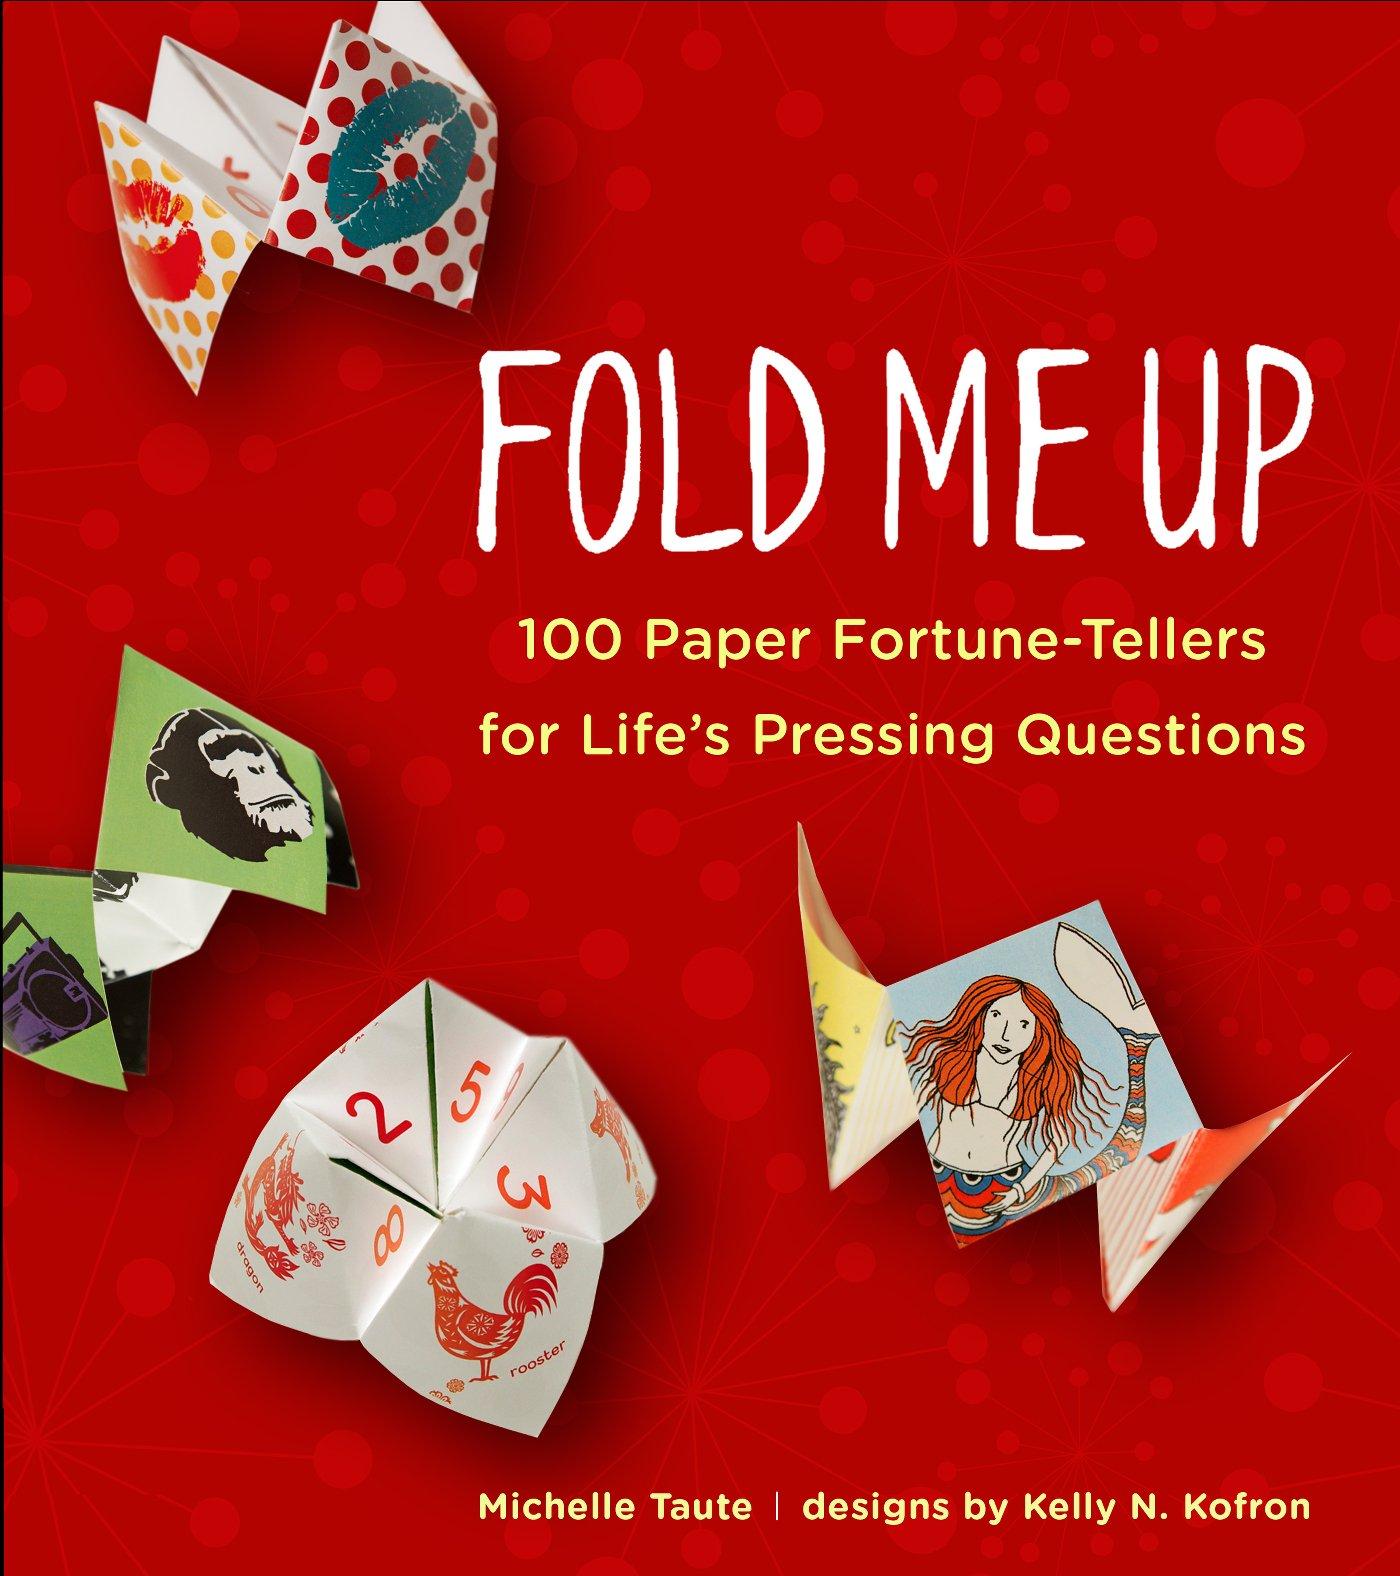 My Handmade Home: Tutorial: Origami Fortune Teller | Social ... | 1576x1400